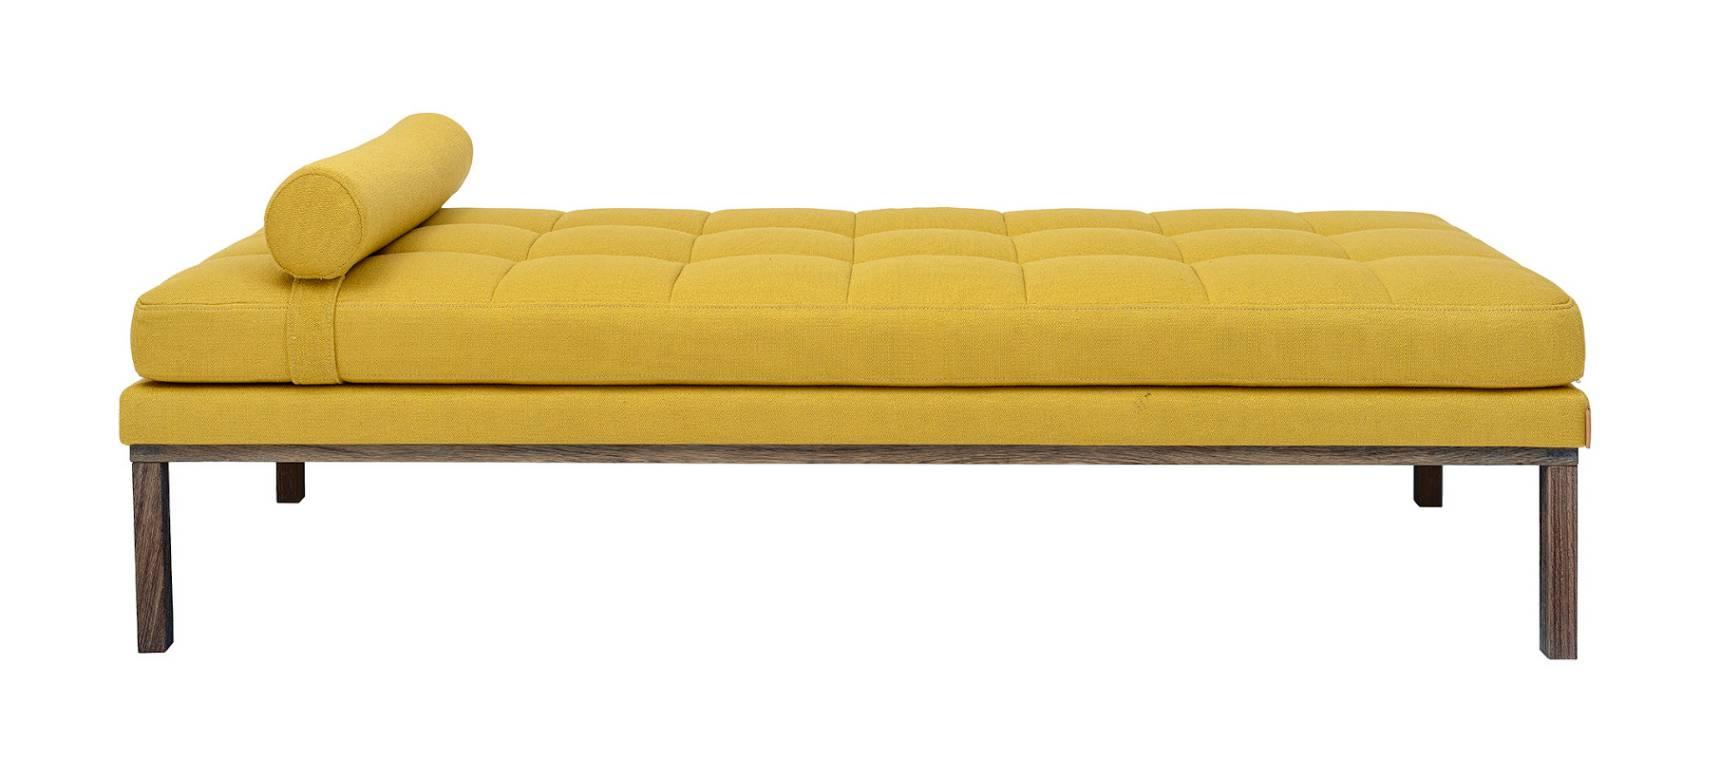 Bloomingville Cita Tagesbett Design Möbel